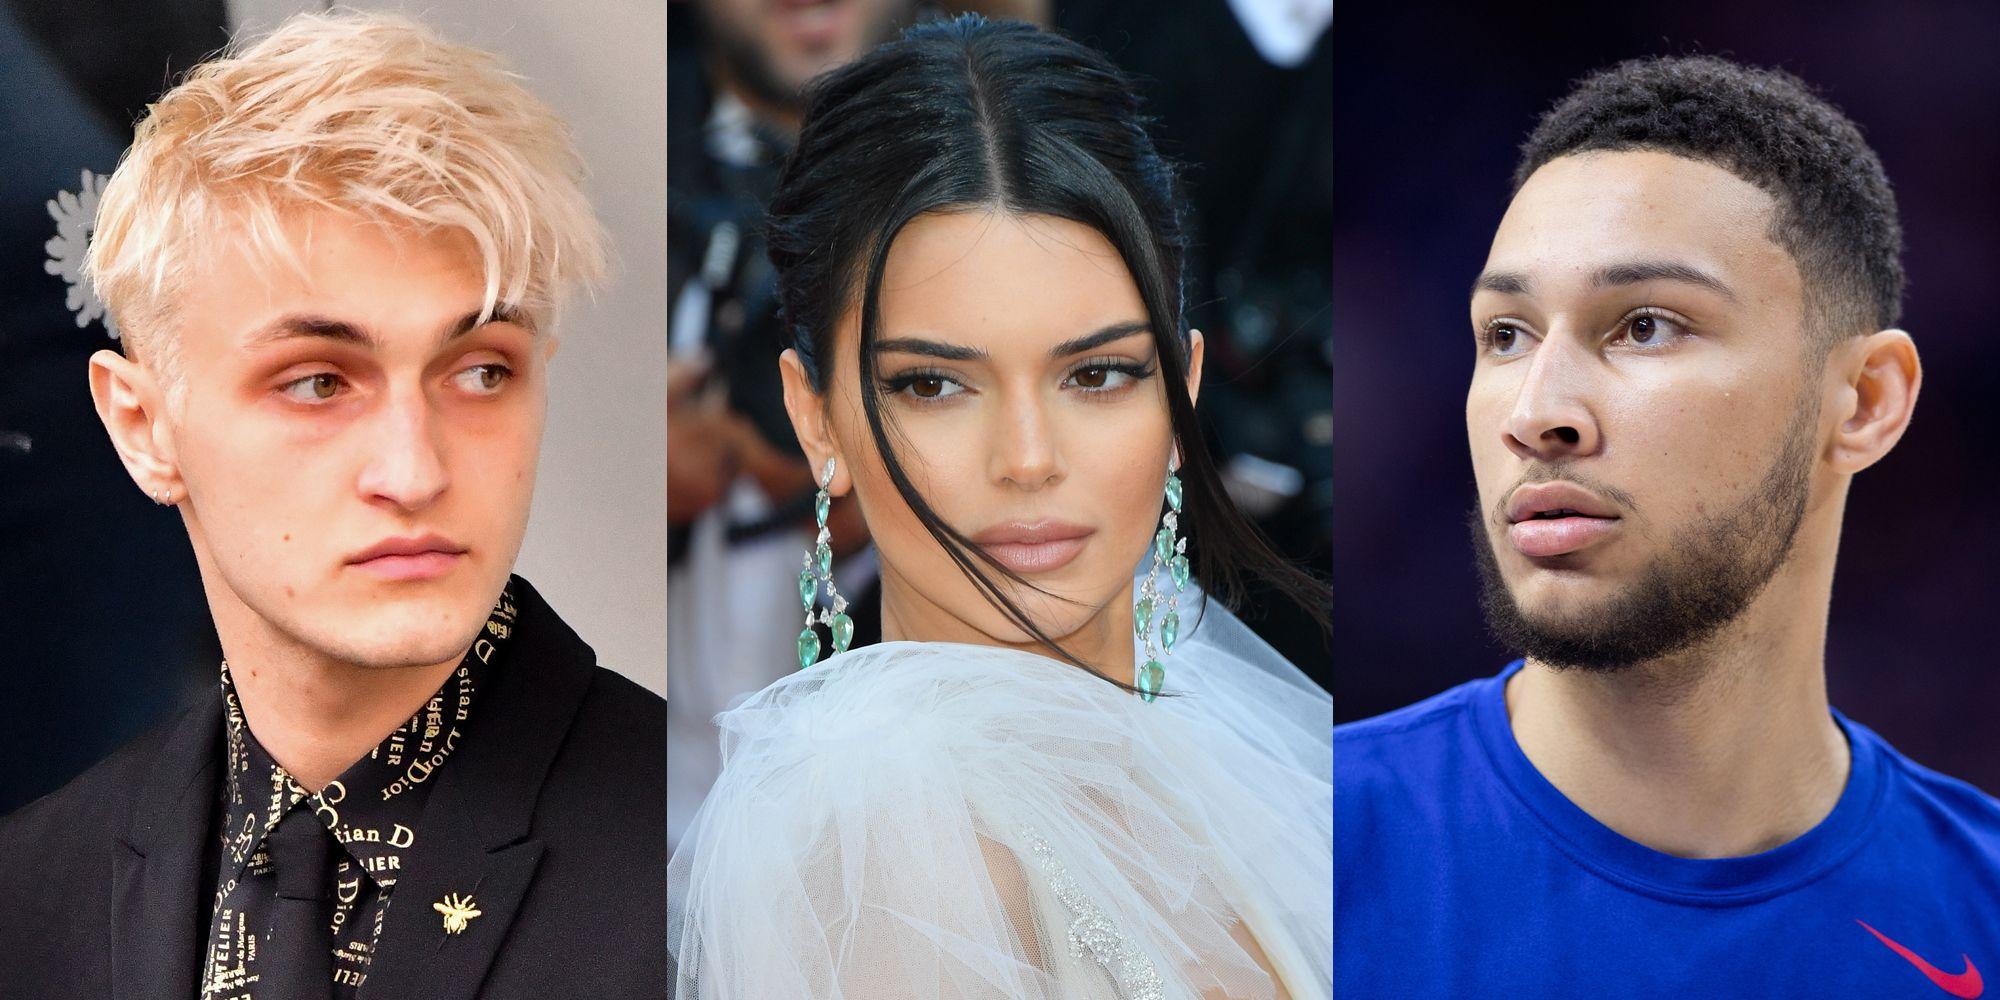 Anwar Hadid, Kendall Jenner, and Ben Simmons